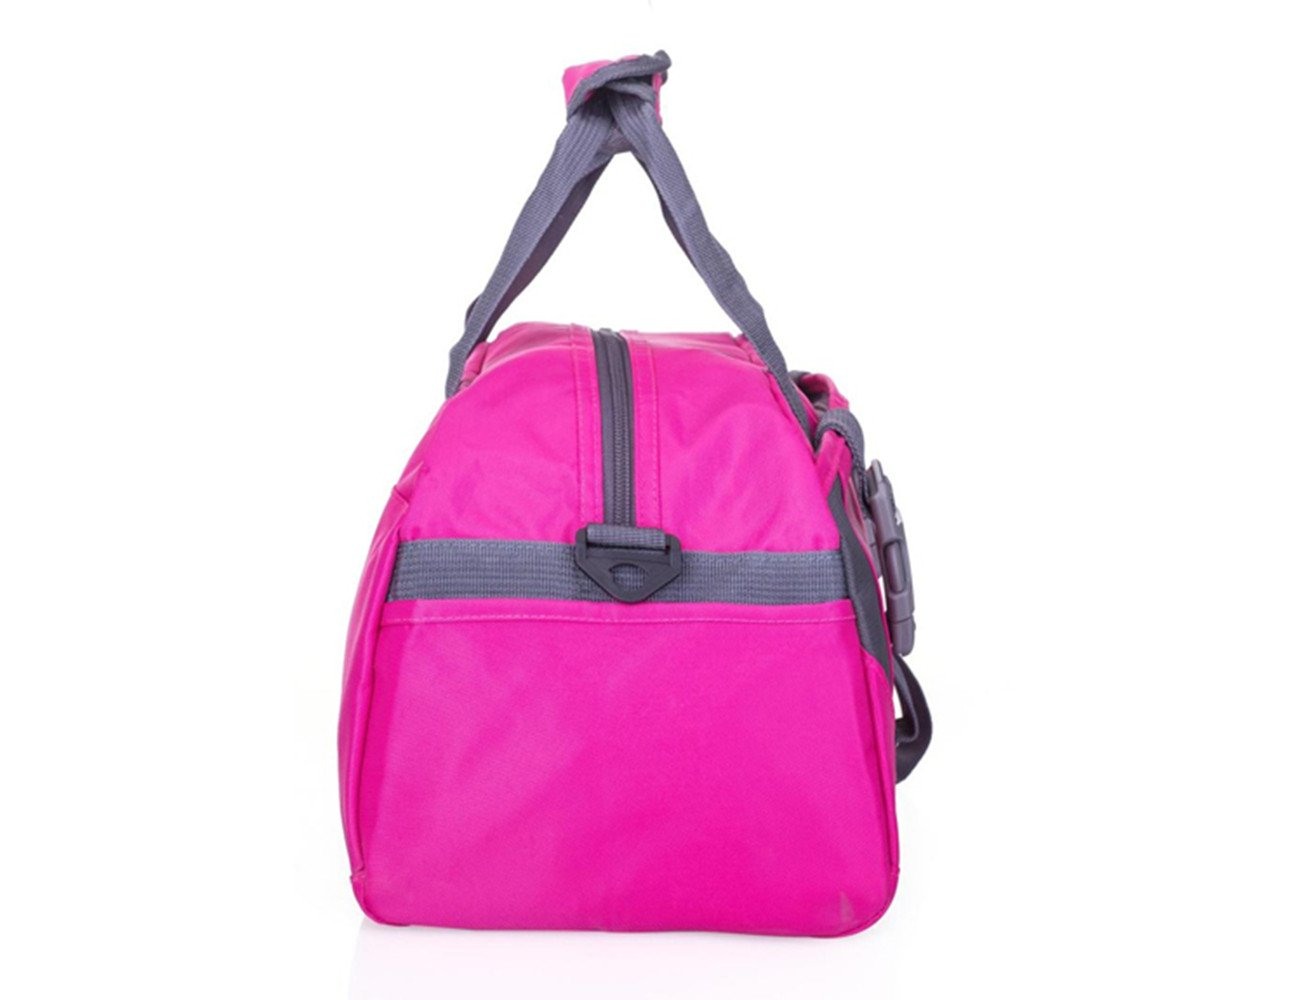 ... Duffle Bag for Girls Sport Gym Bags for Women Yoga Bag larger image 538903b5c631b